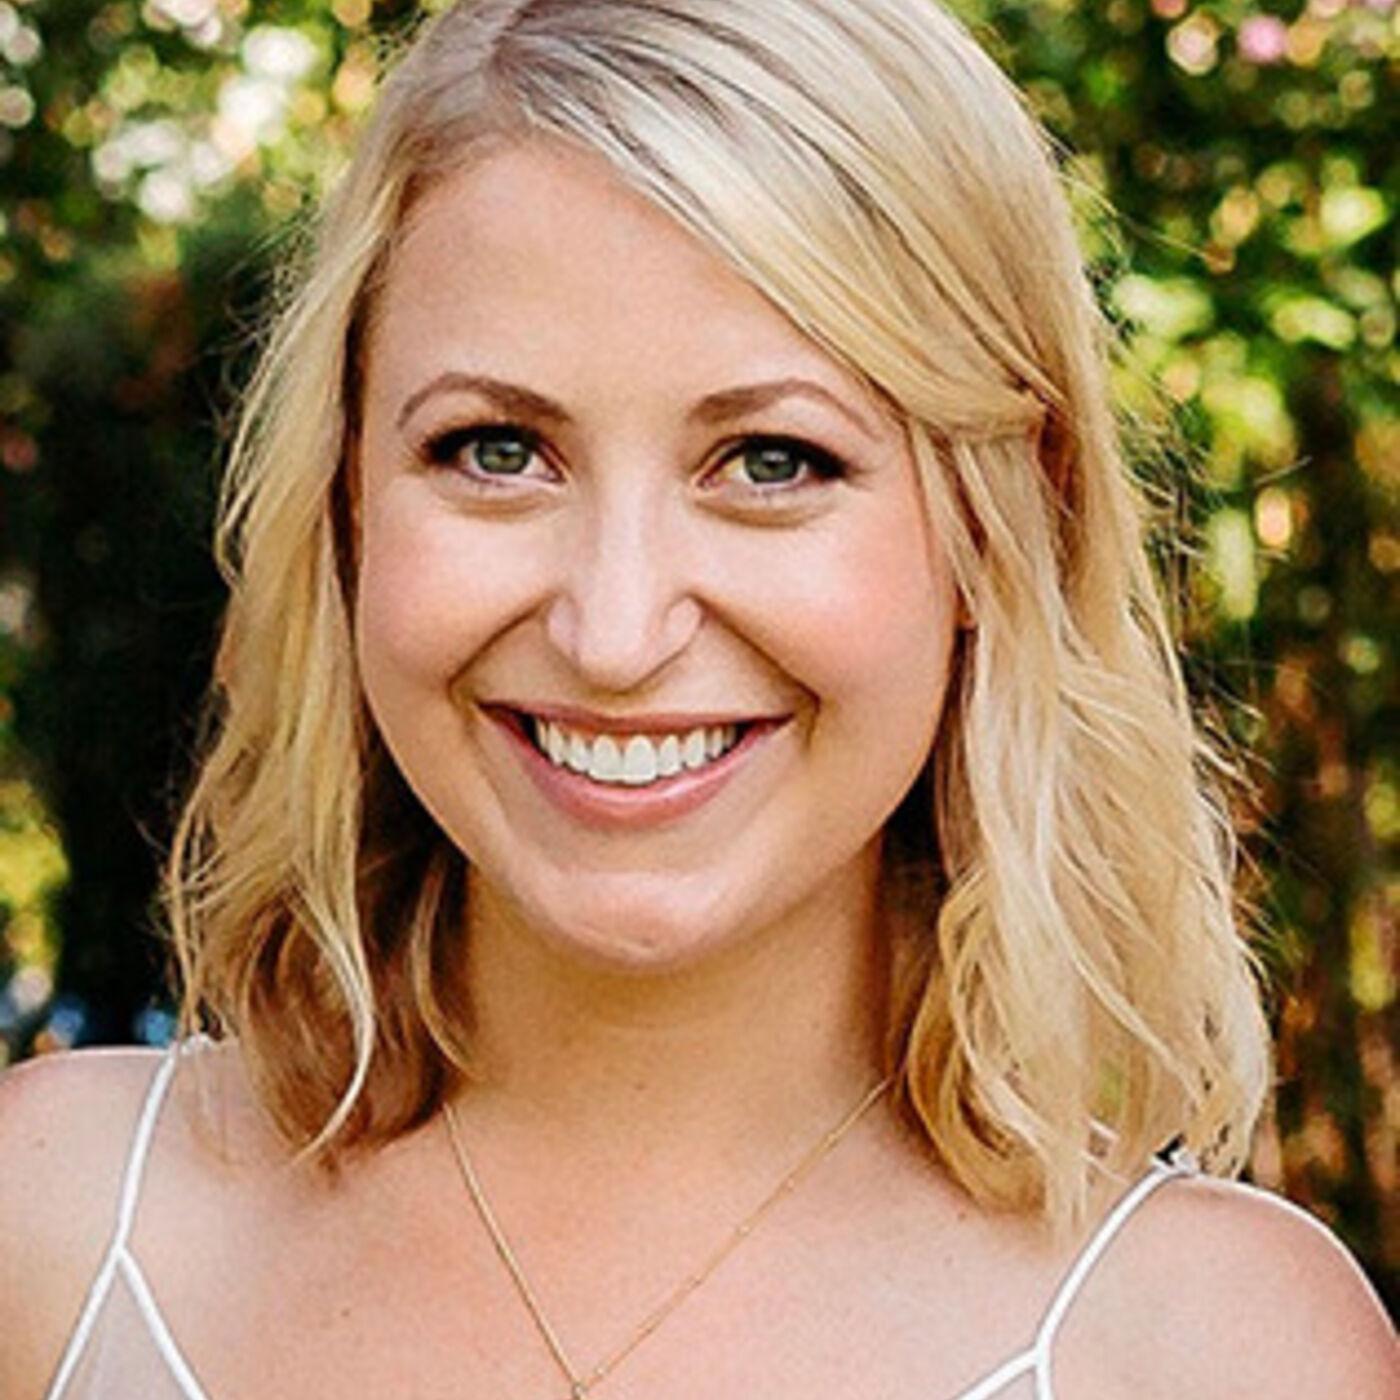 #9: Kathryn Oliver of Joey Restaurant Group